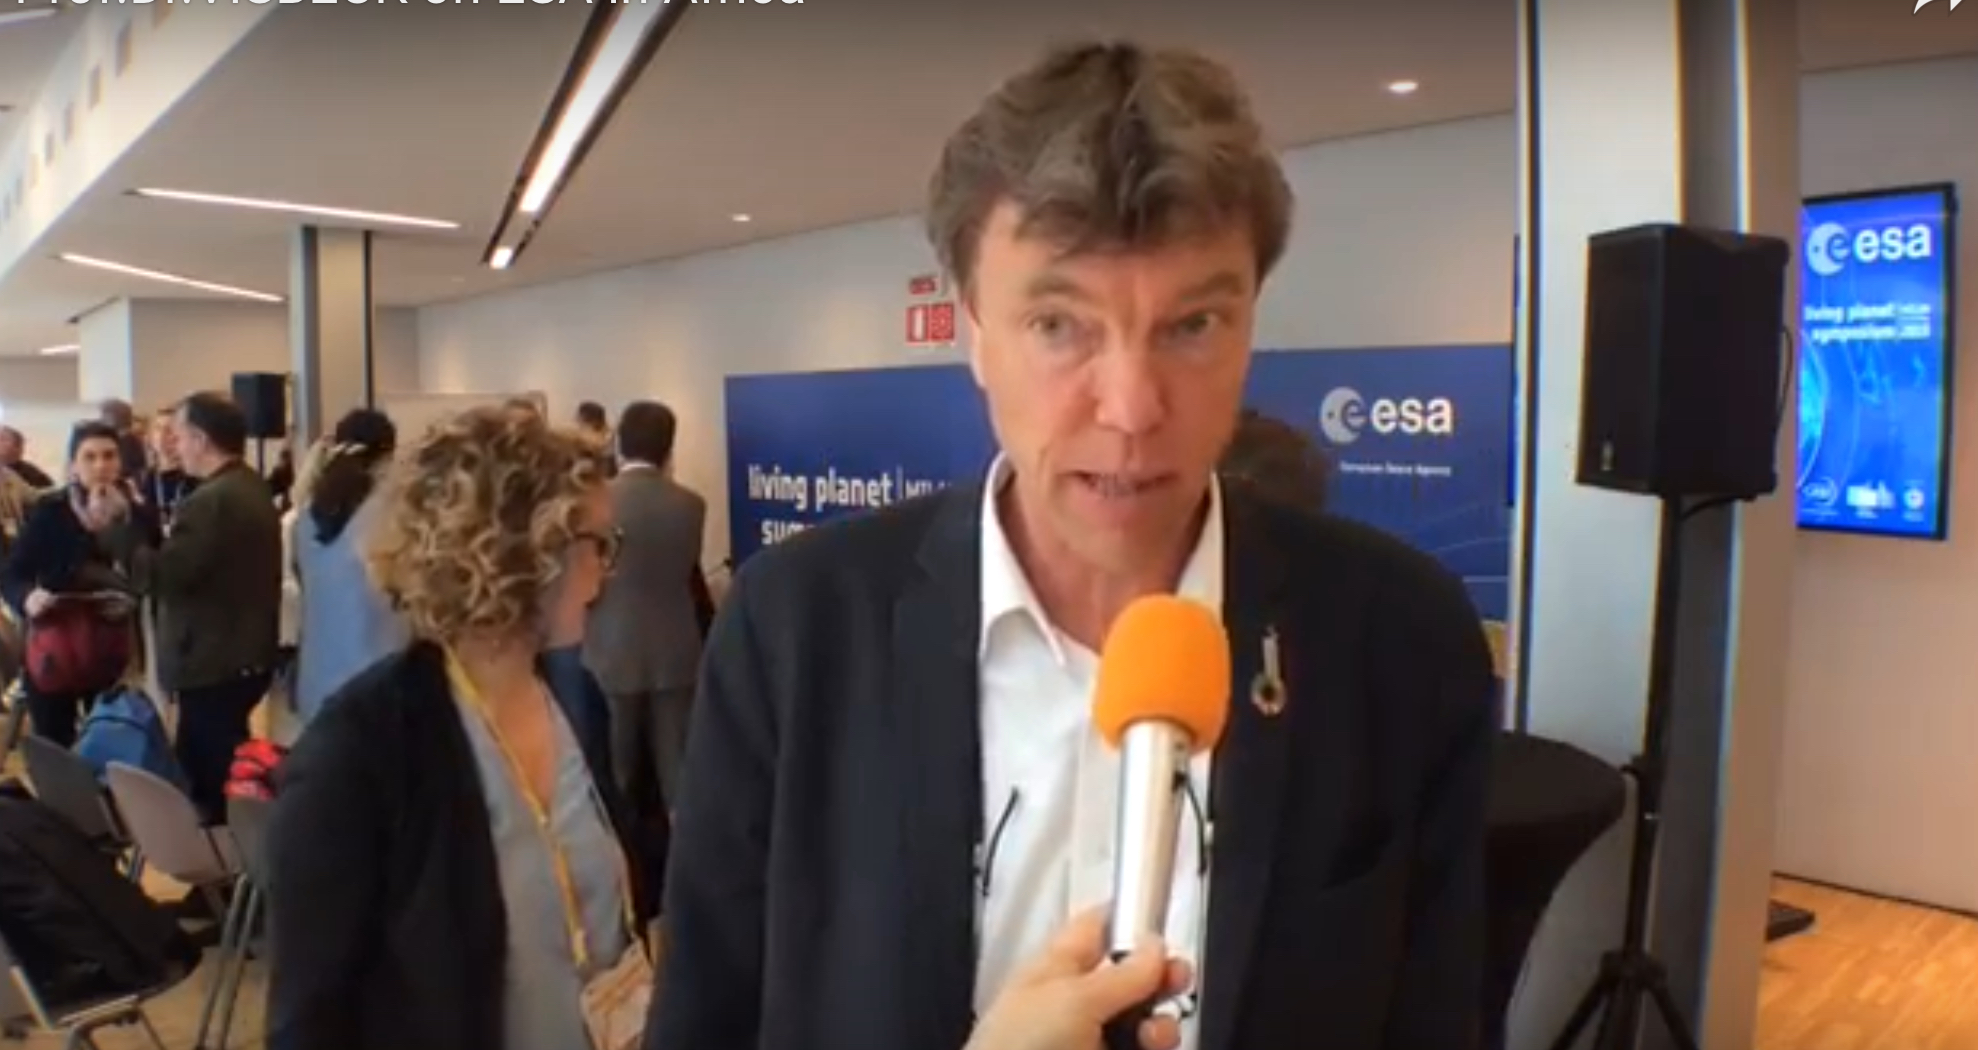 #LPS19: ESA upgrades Africa partnerships